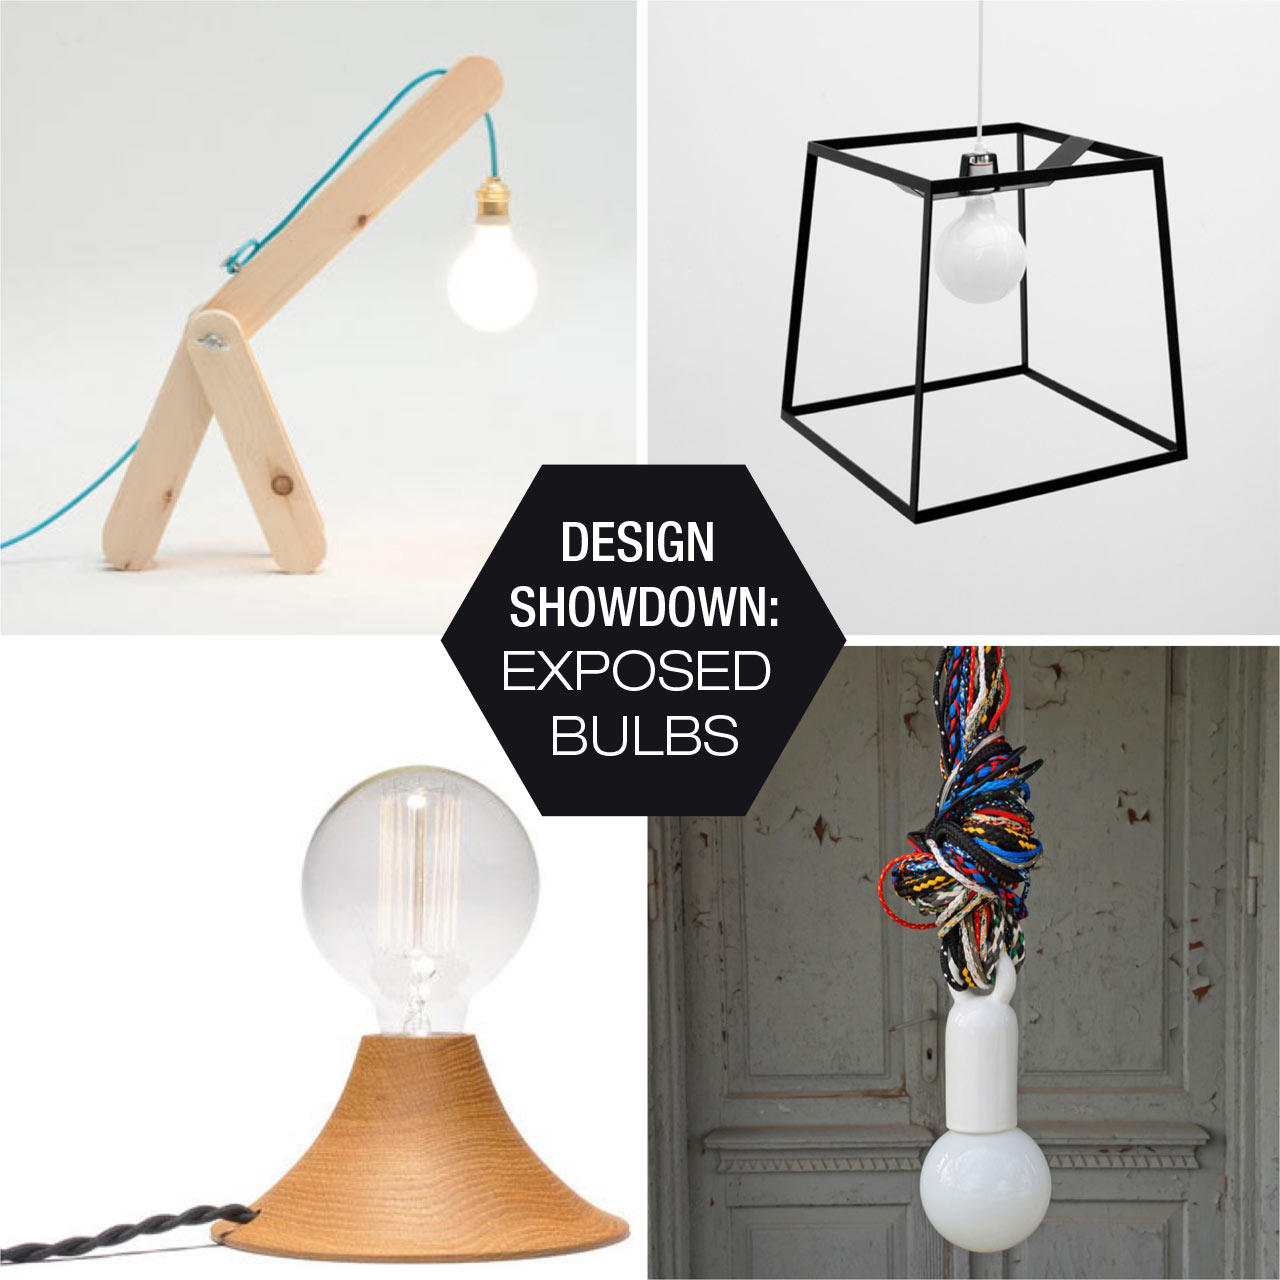 Design Showdown: Exposed Bulbs